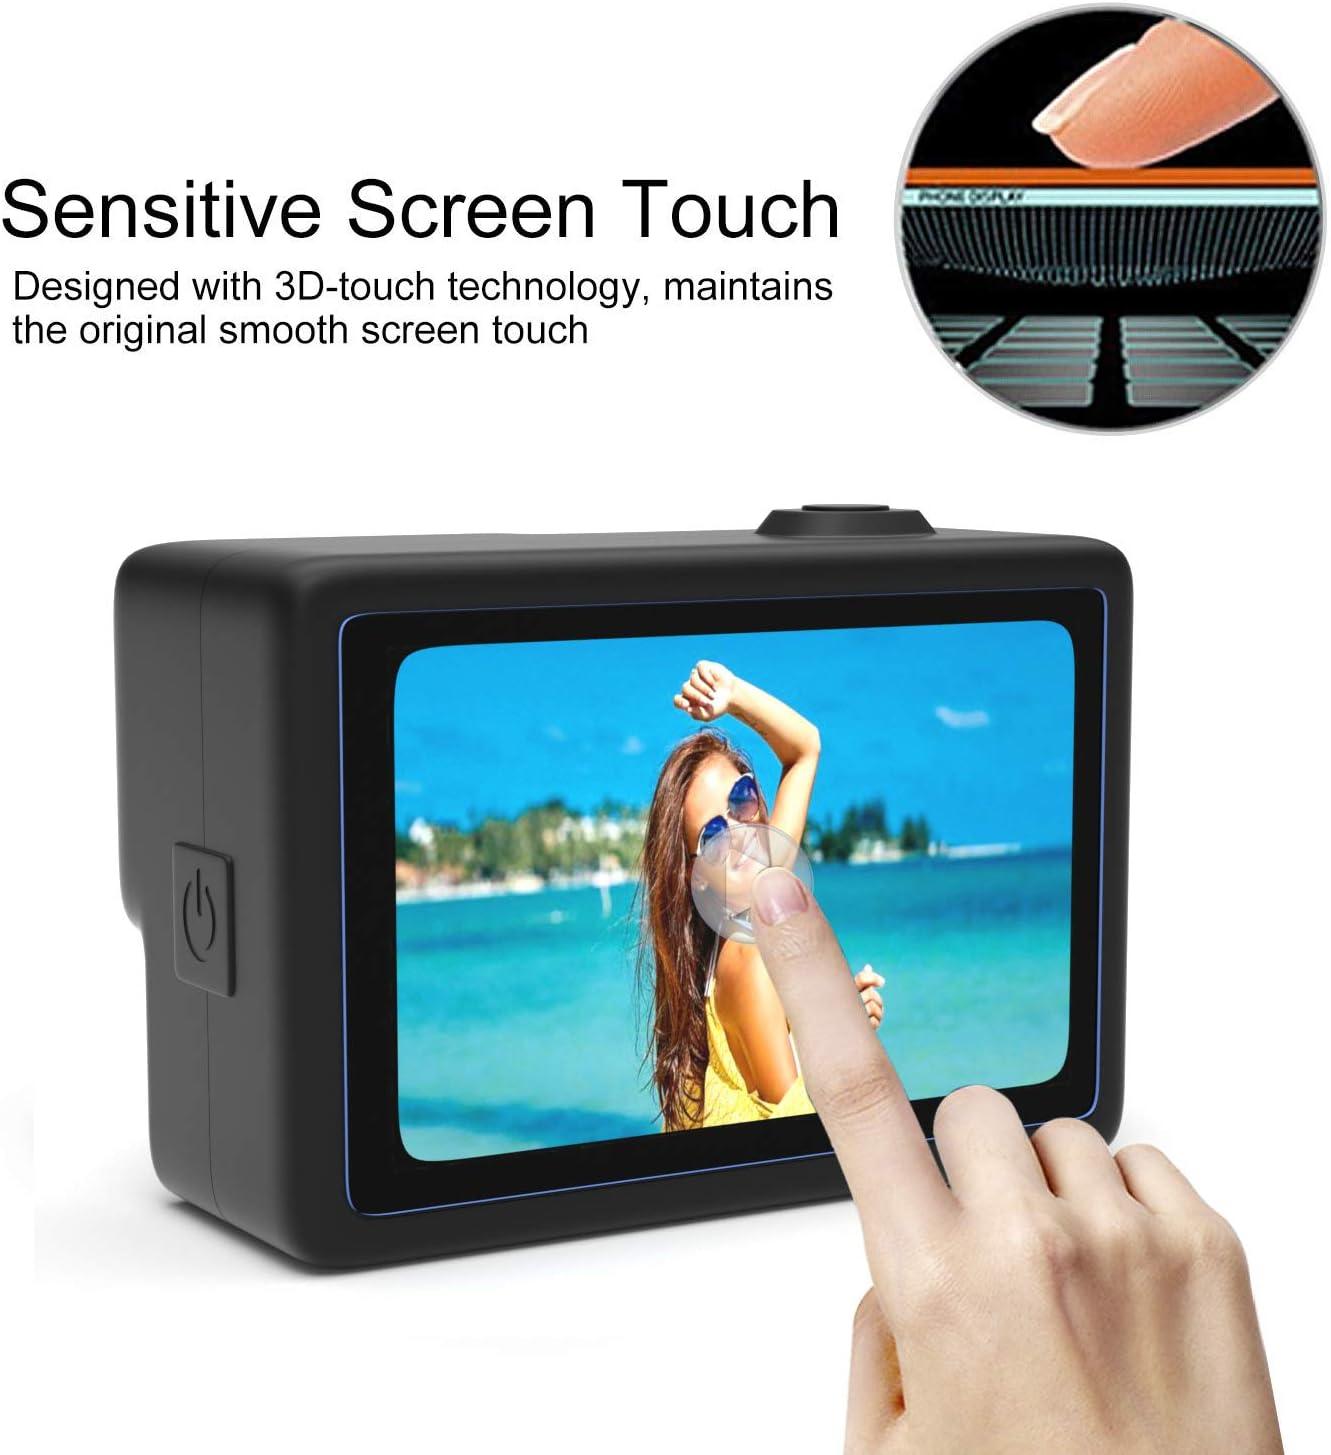 Tempered Glass Lens Protector 【6Pcs】 Screen Protector for GoPro Hero 7 Black//Hero 6//Hero 5// Hero 2018 Hongdak Tempered Glass Screen Protector Small Display Film Accessories for GoPro Camera